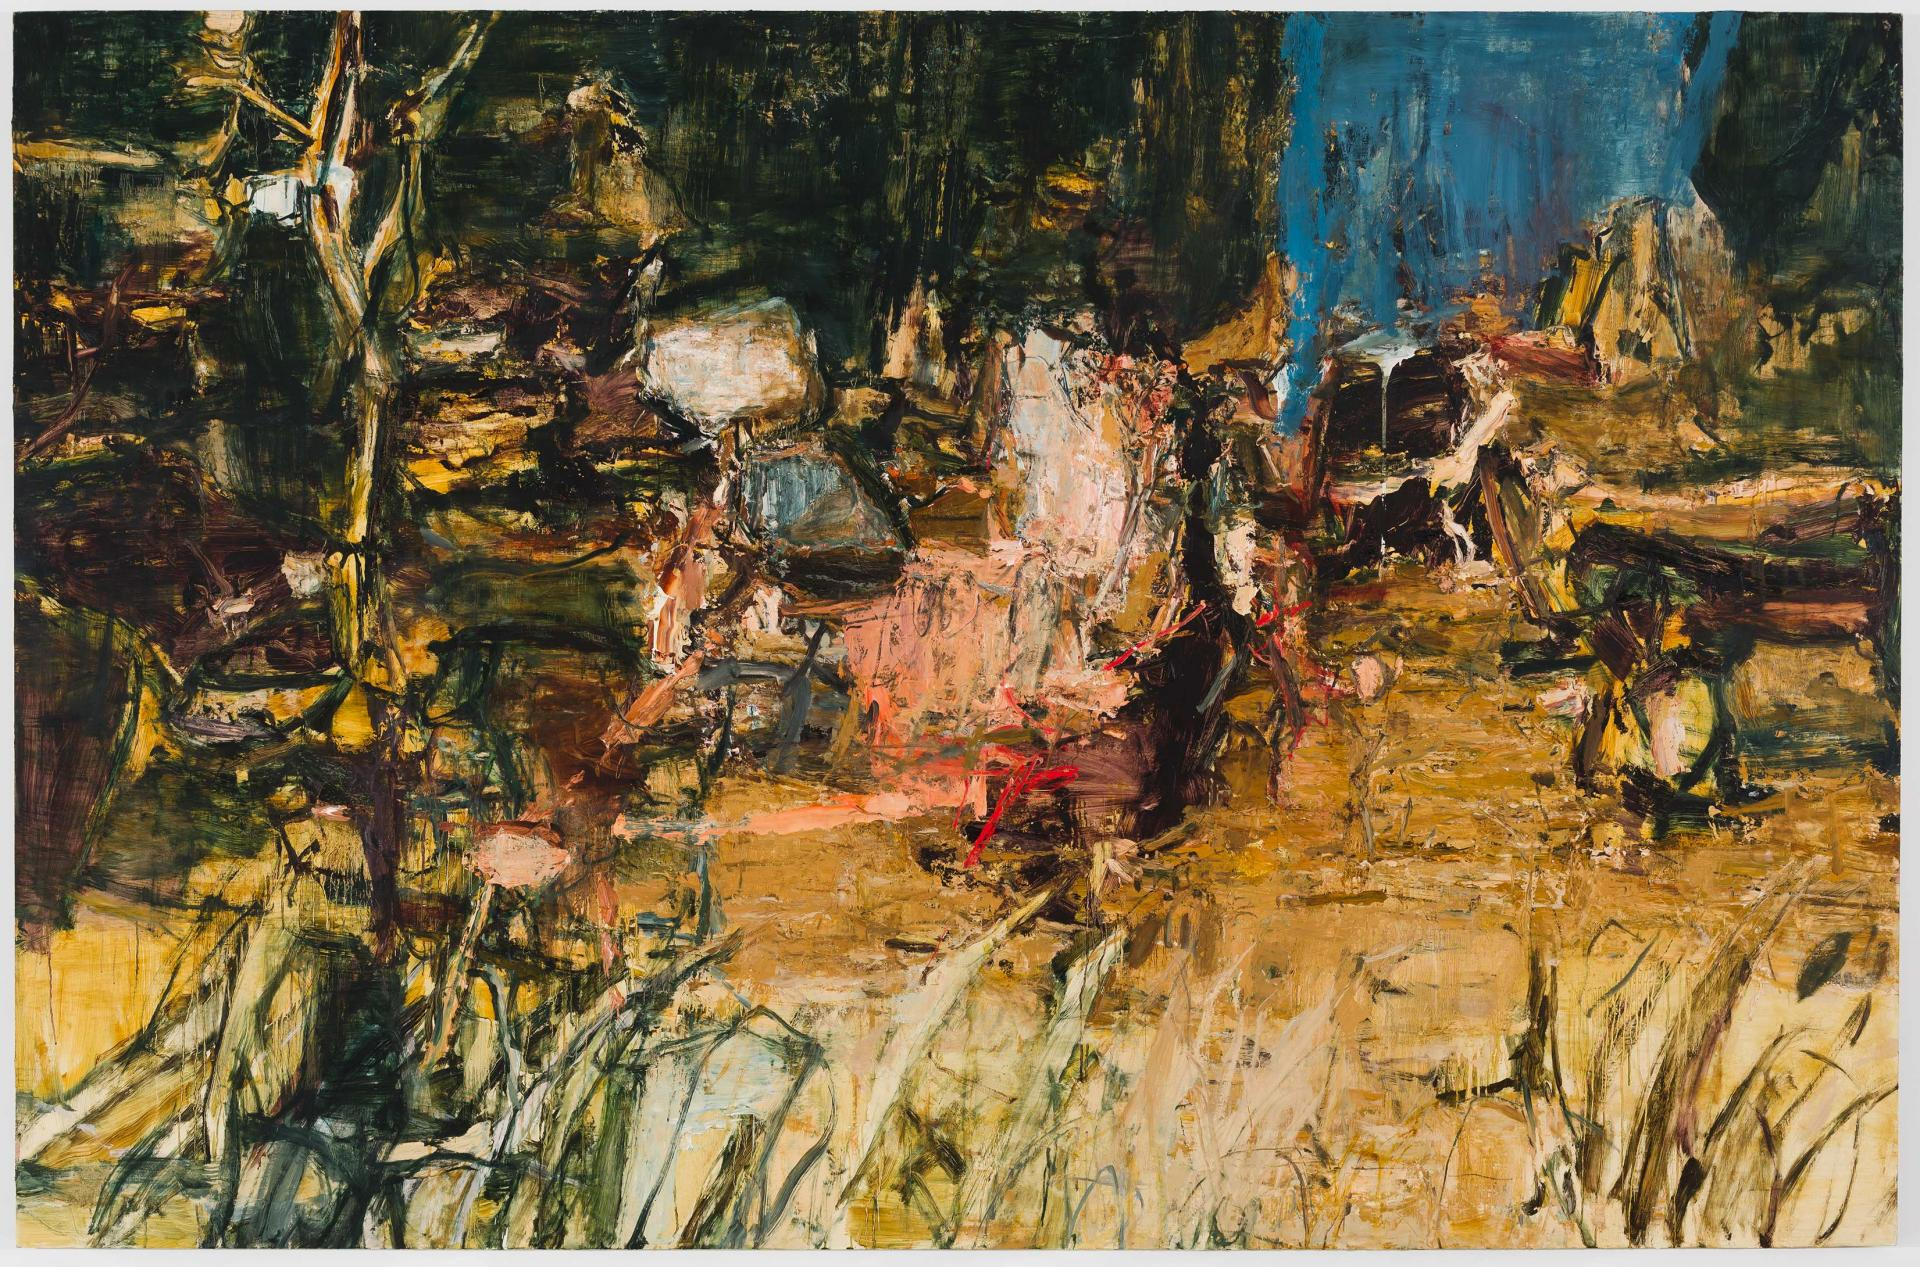 Tu Hongtao, Drunken Forest 2020 Oil on canvas 82 11/16 x 126 inches (210 x 320 cm) © Tu Hongtao